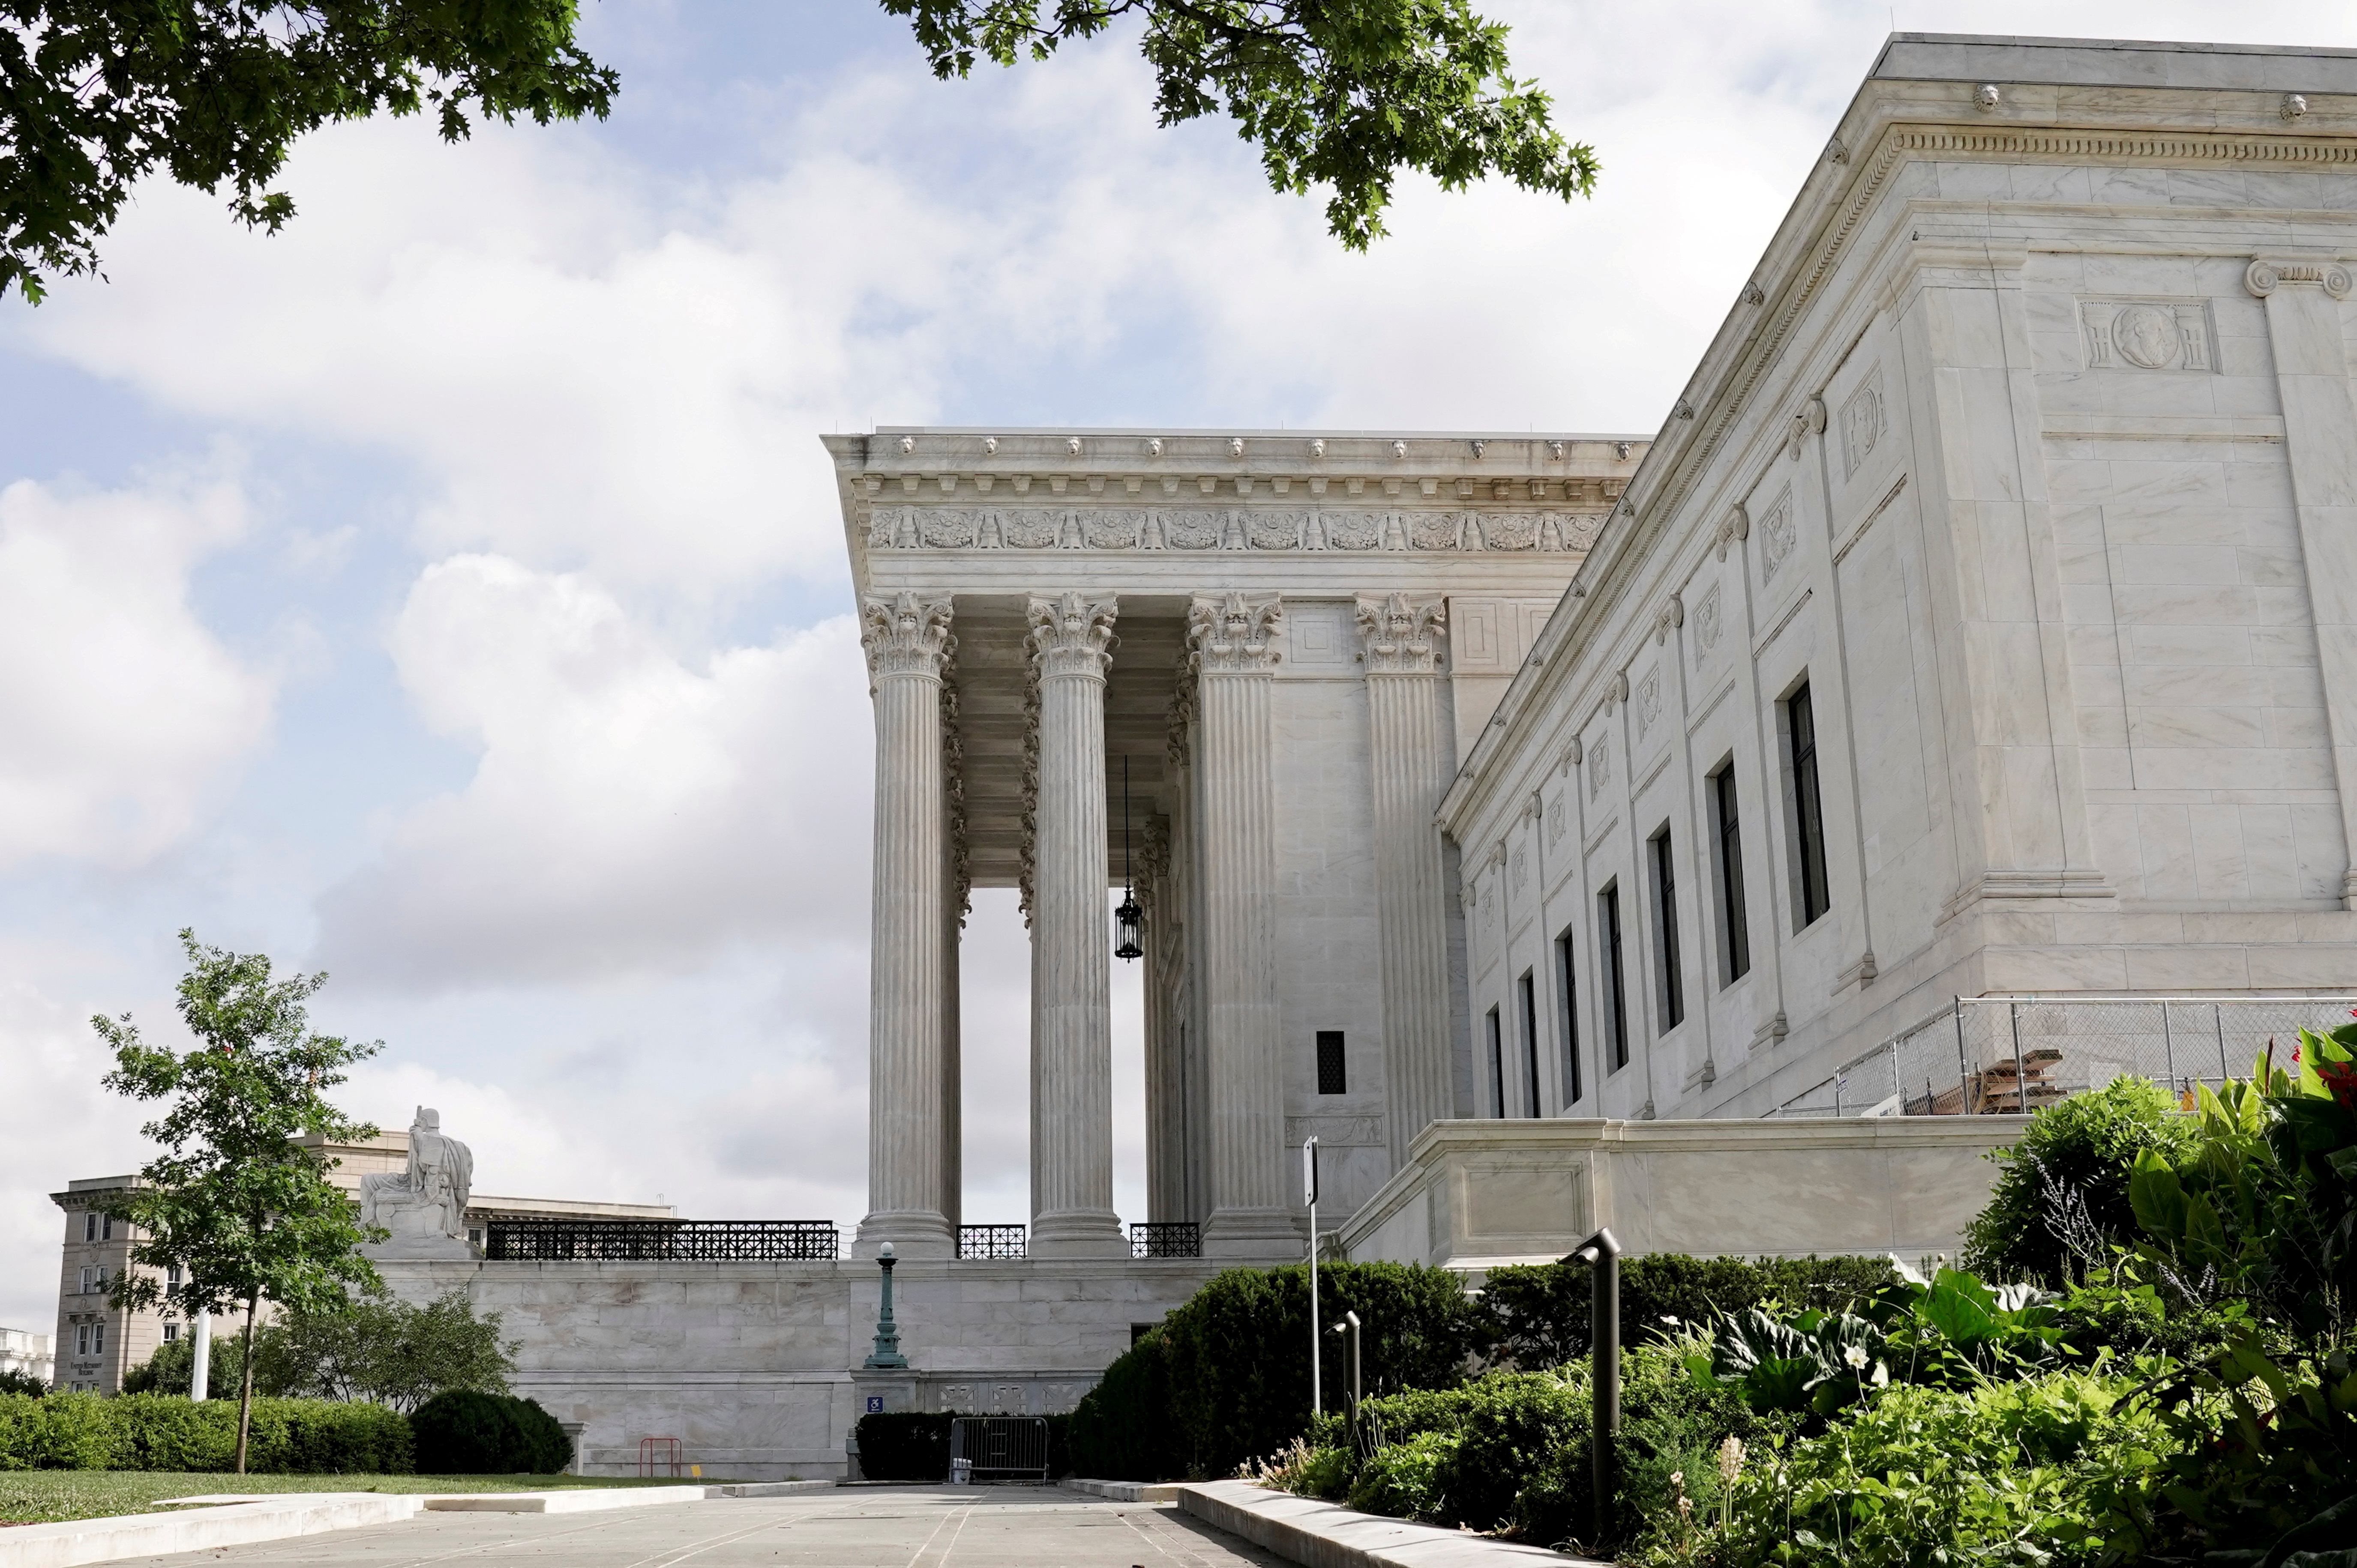 A general view of the U.S. Supreme Court building in Washington, D.C., U.S. June 25, 2021. REUTERS/Ken Cedeno/File Photo